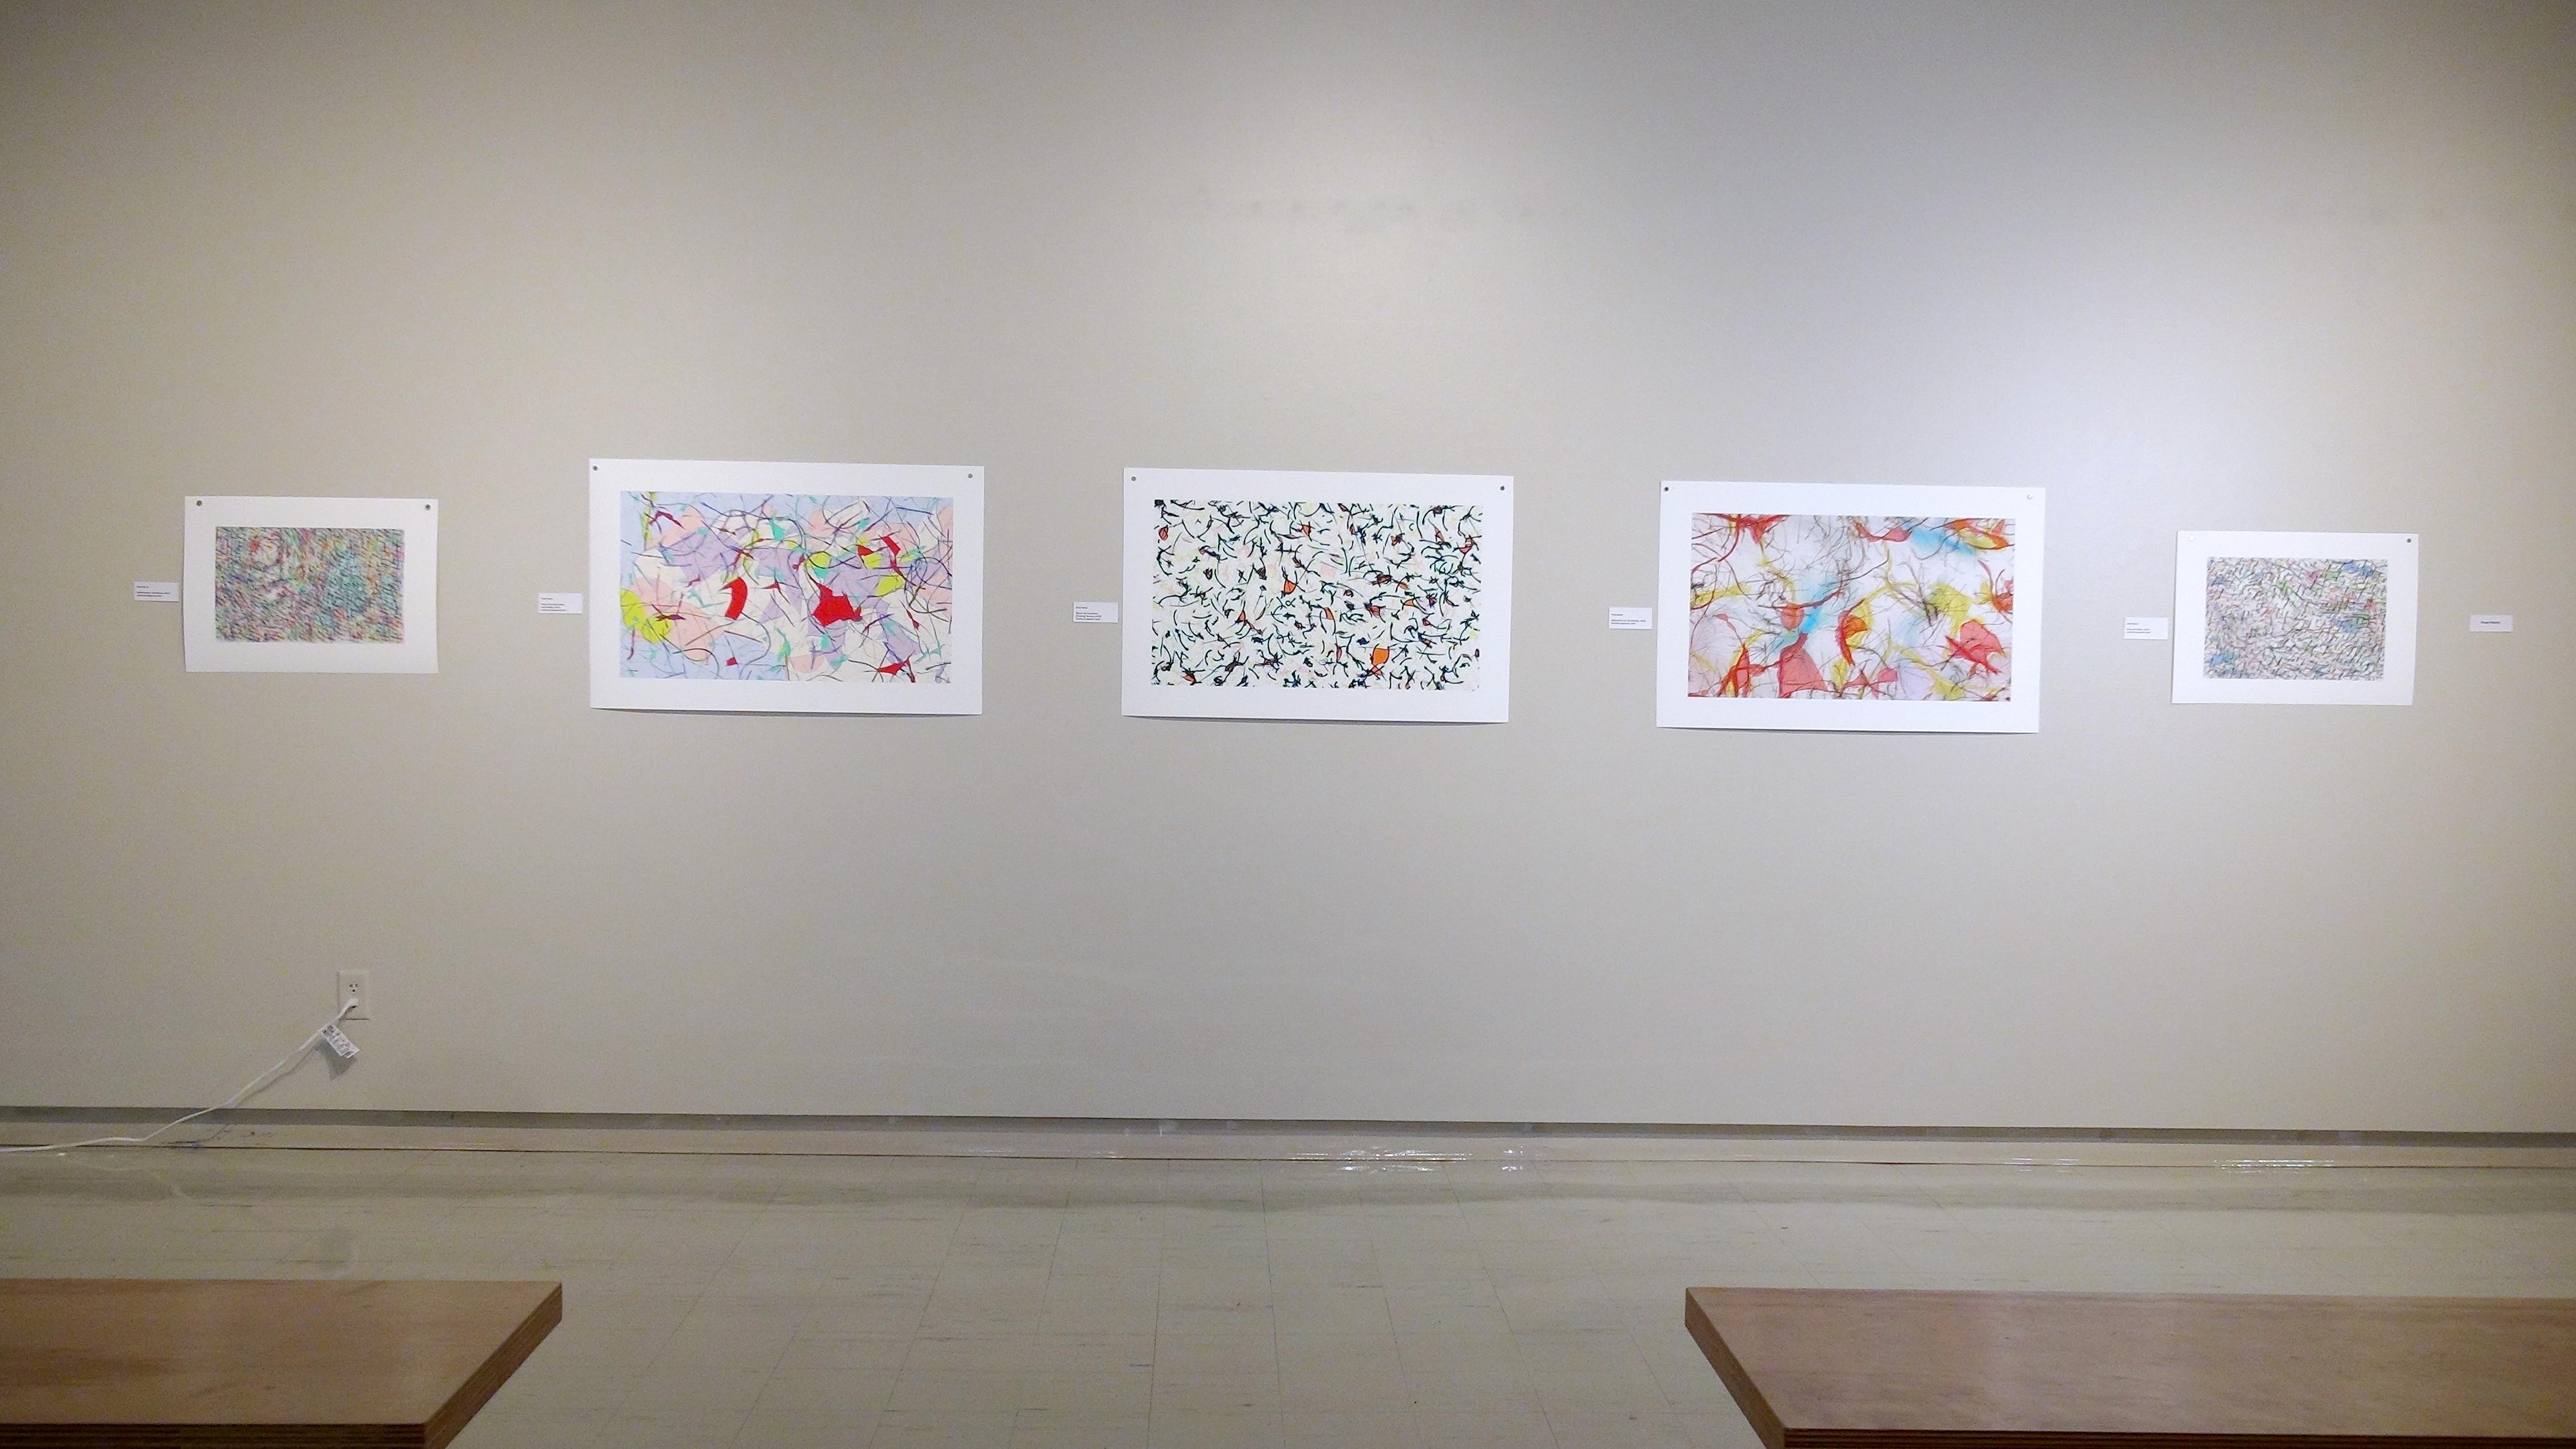 Paul Hertz, prints generated through custom designed boids flocking software